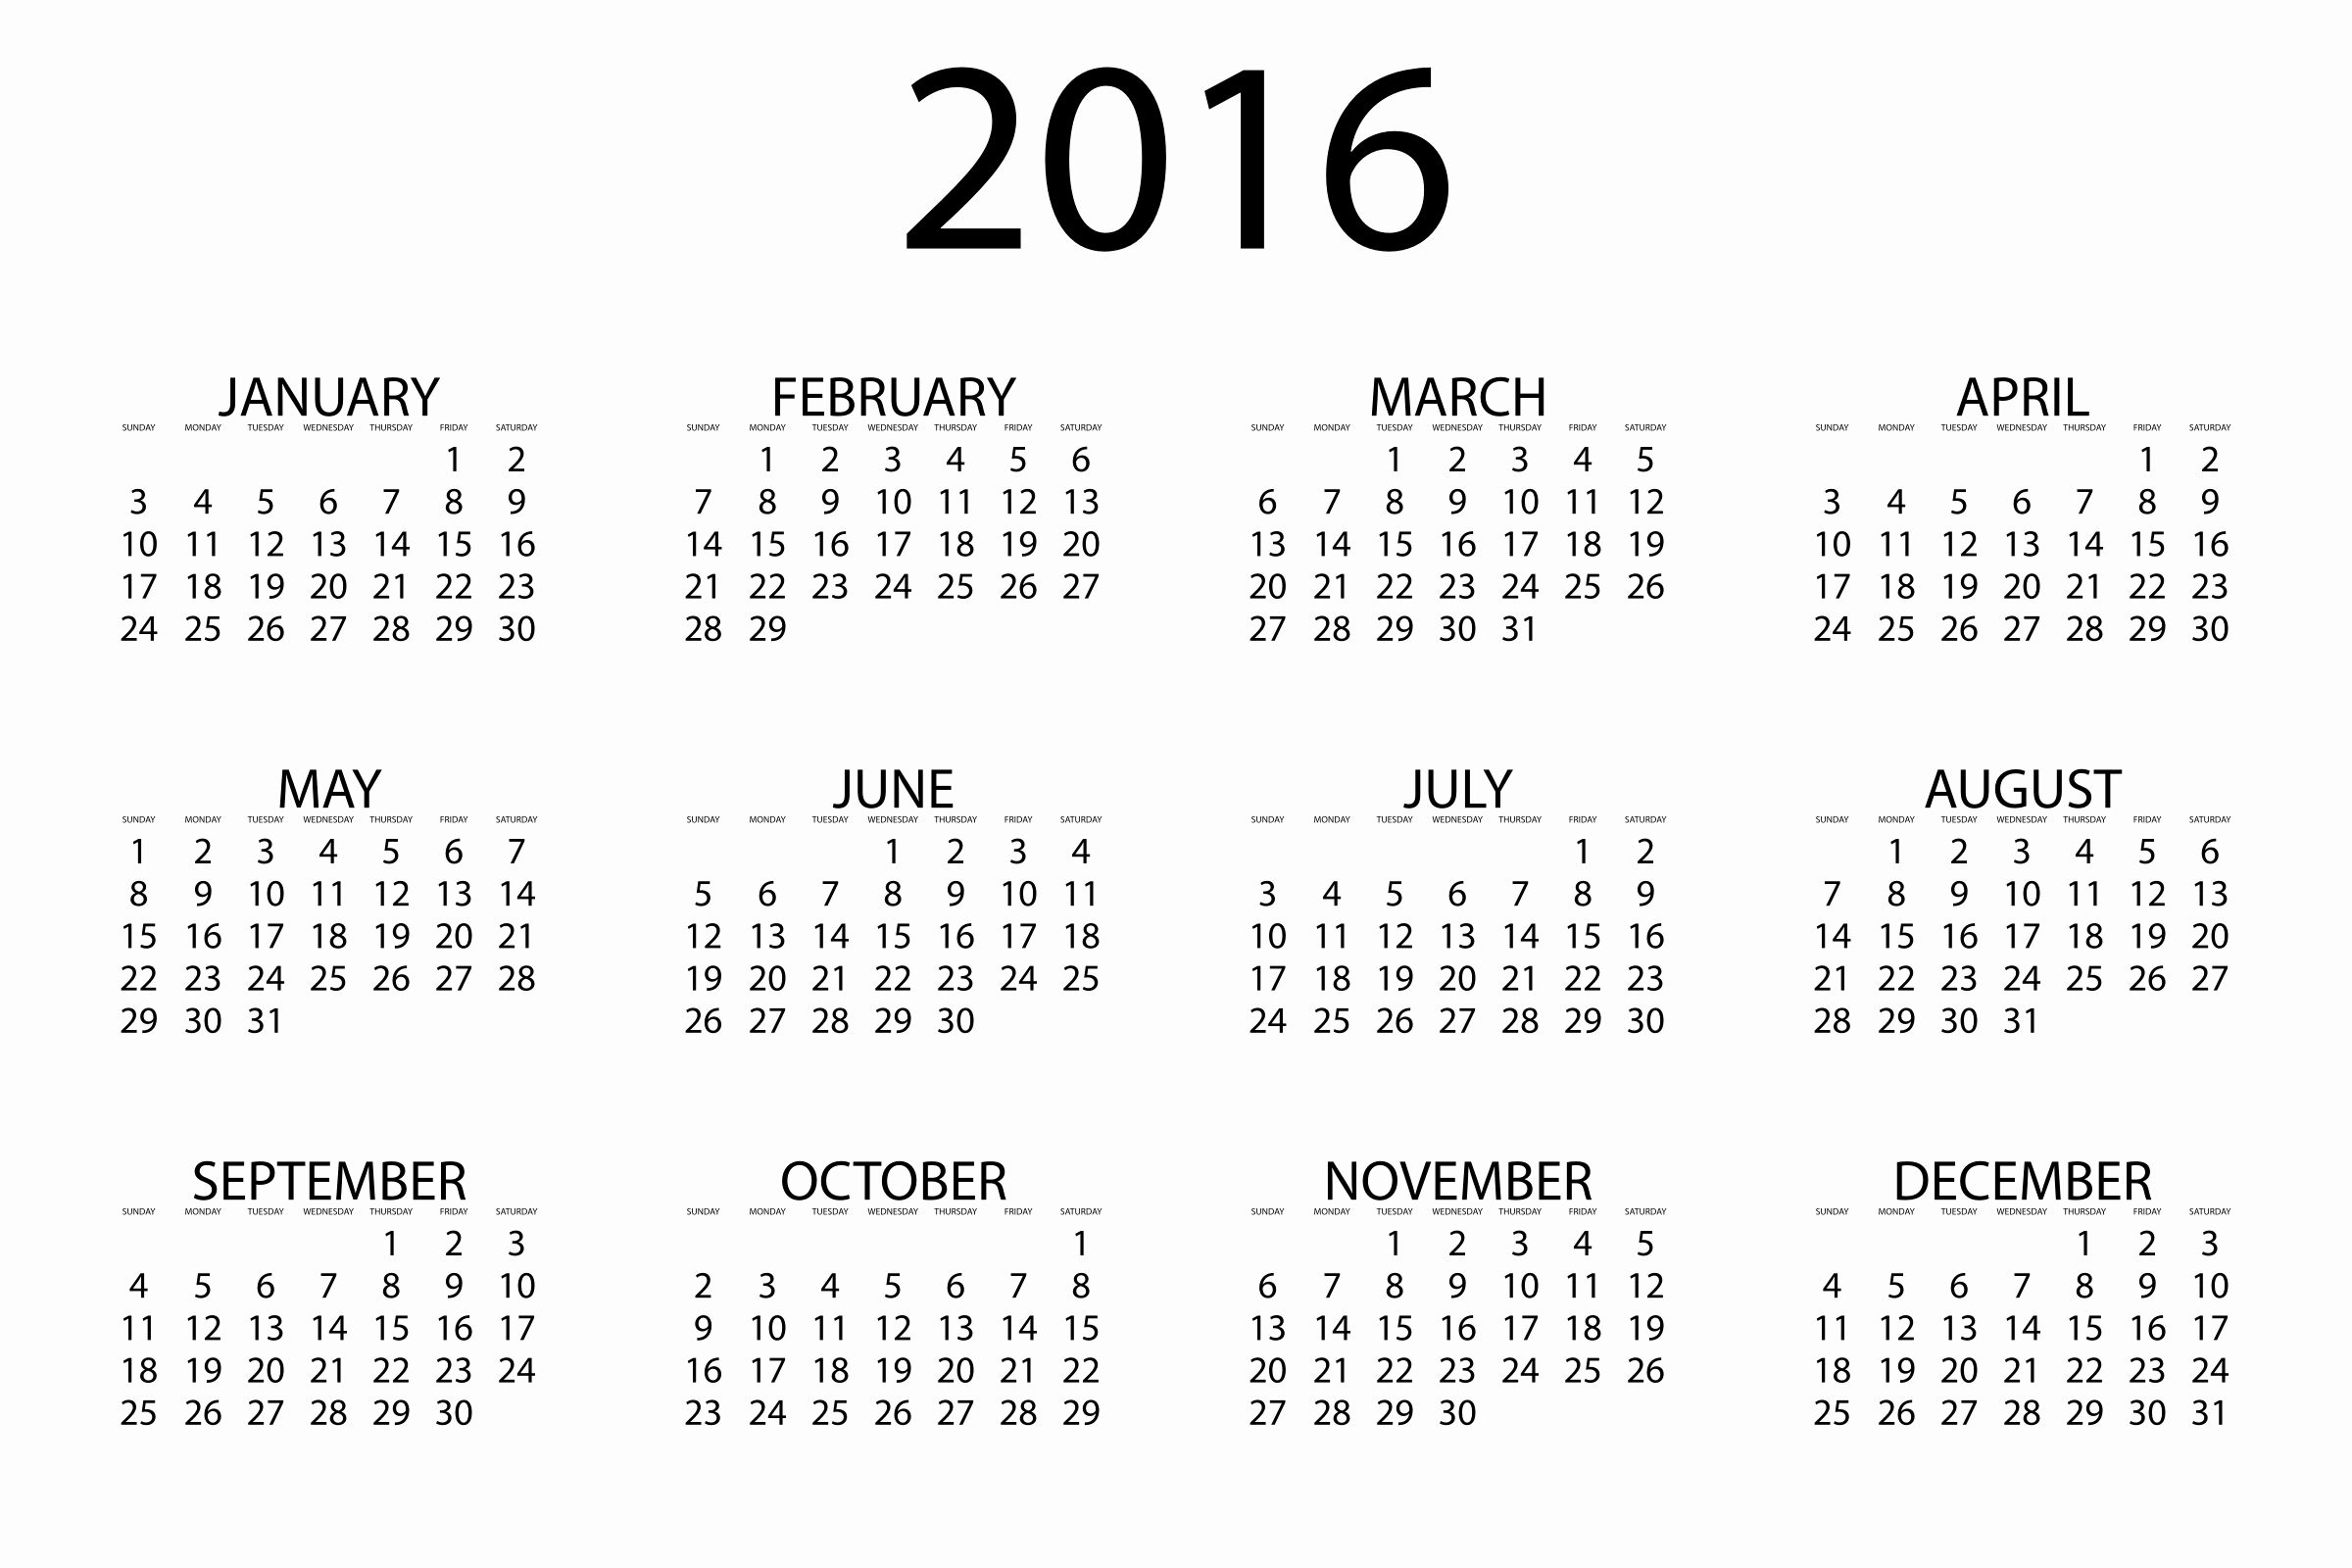 5 Year Calendar Starting 2016 Elegant Download 2016 Calendar Yourmomhatesthis Aoplsme